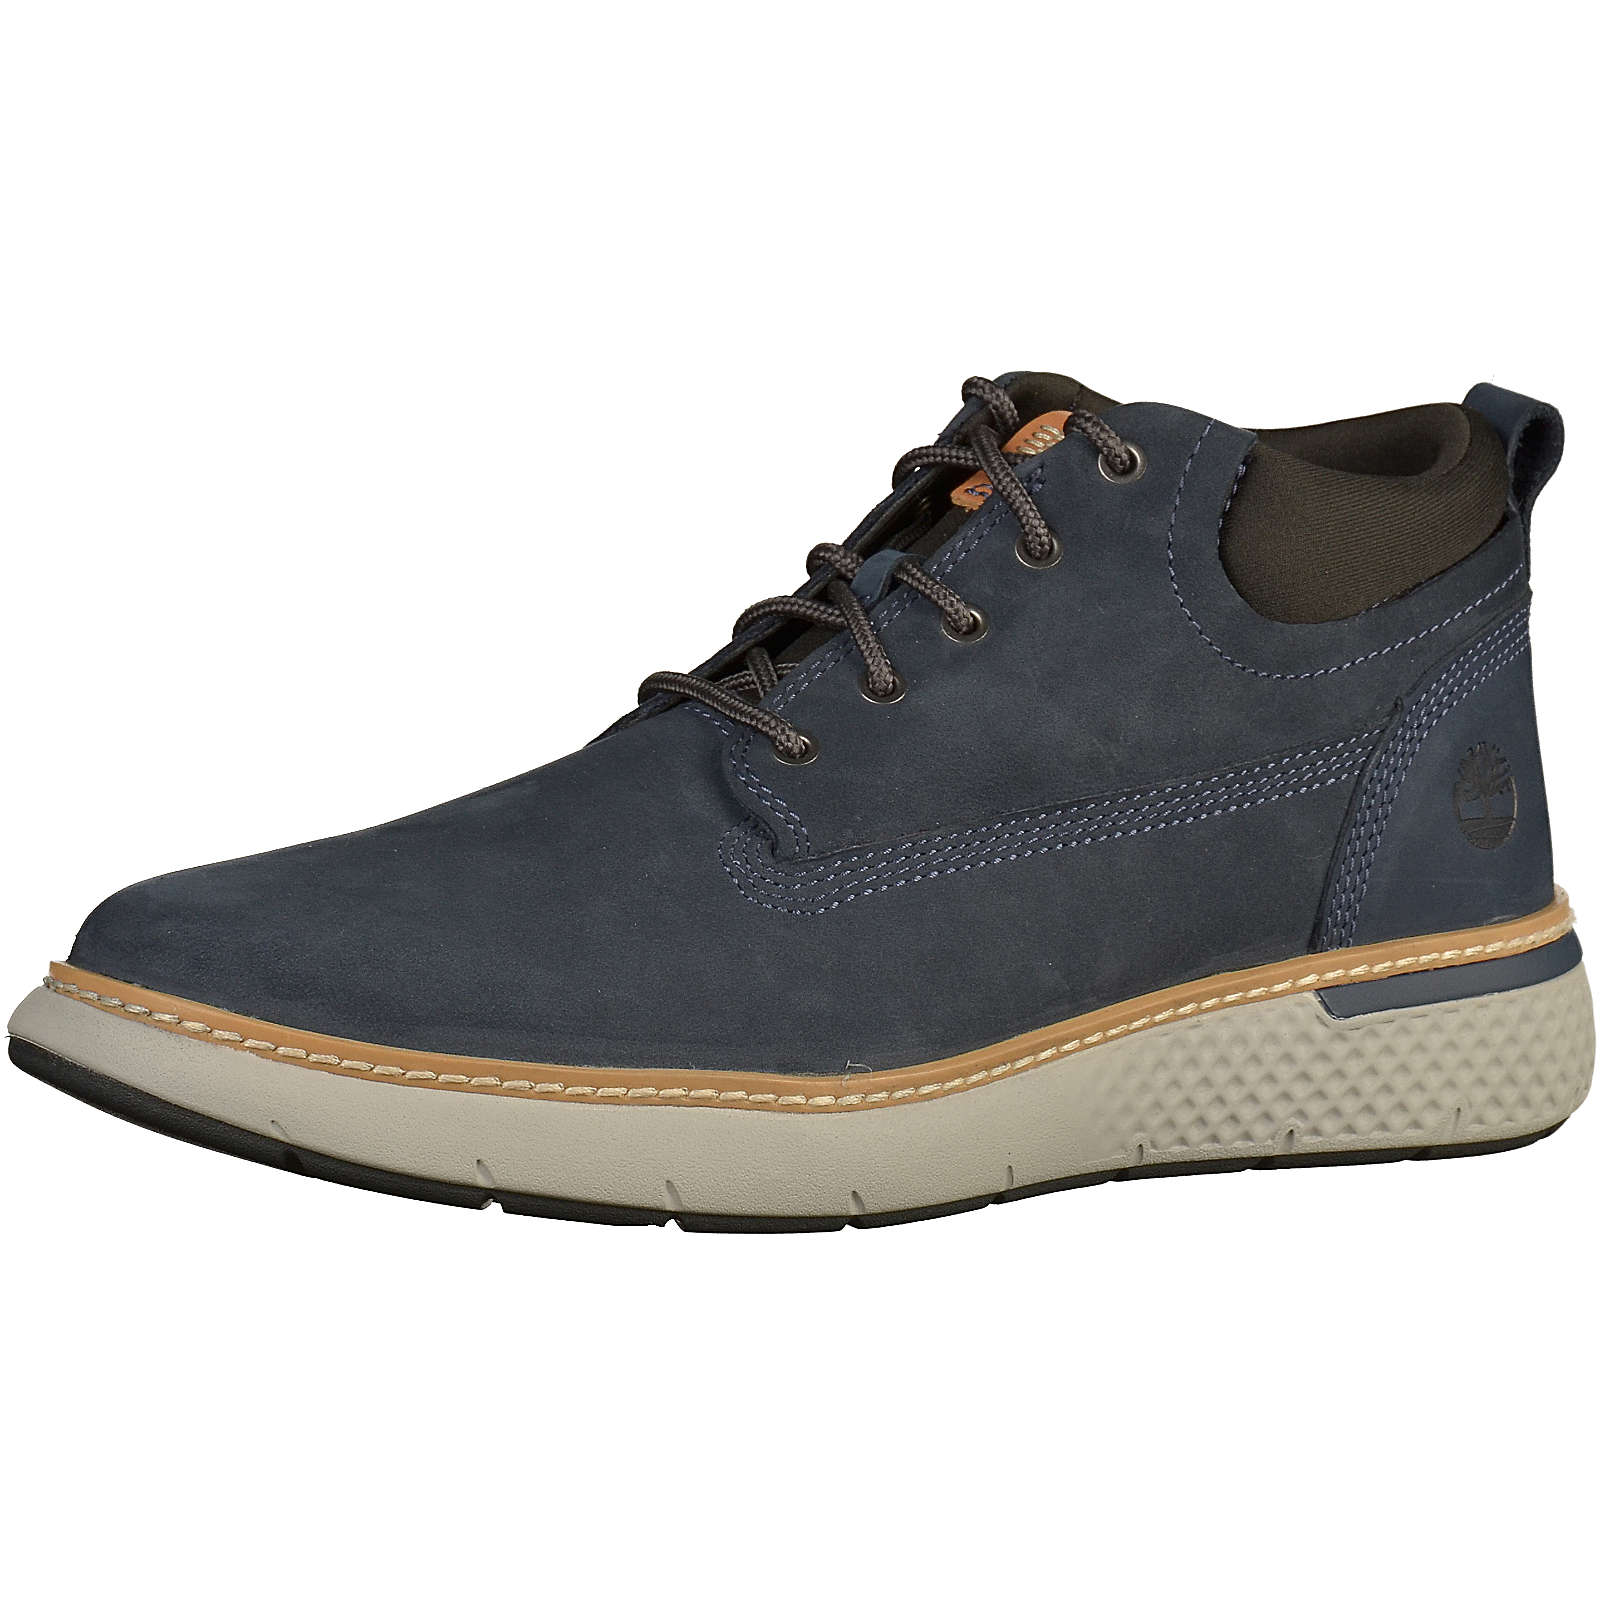 Timberland Sneaker Schnürschuhe blau Herren Gr. 44